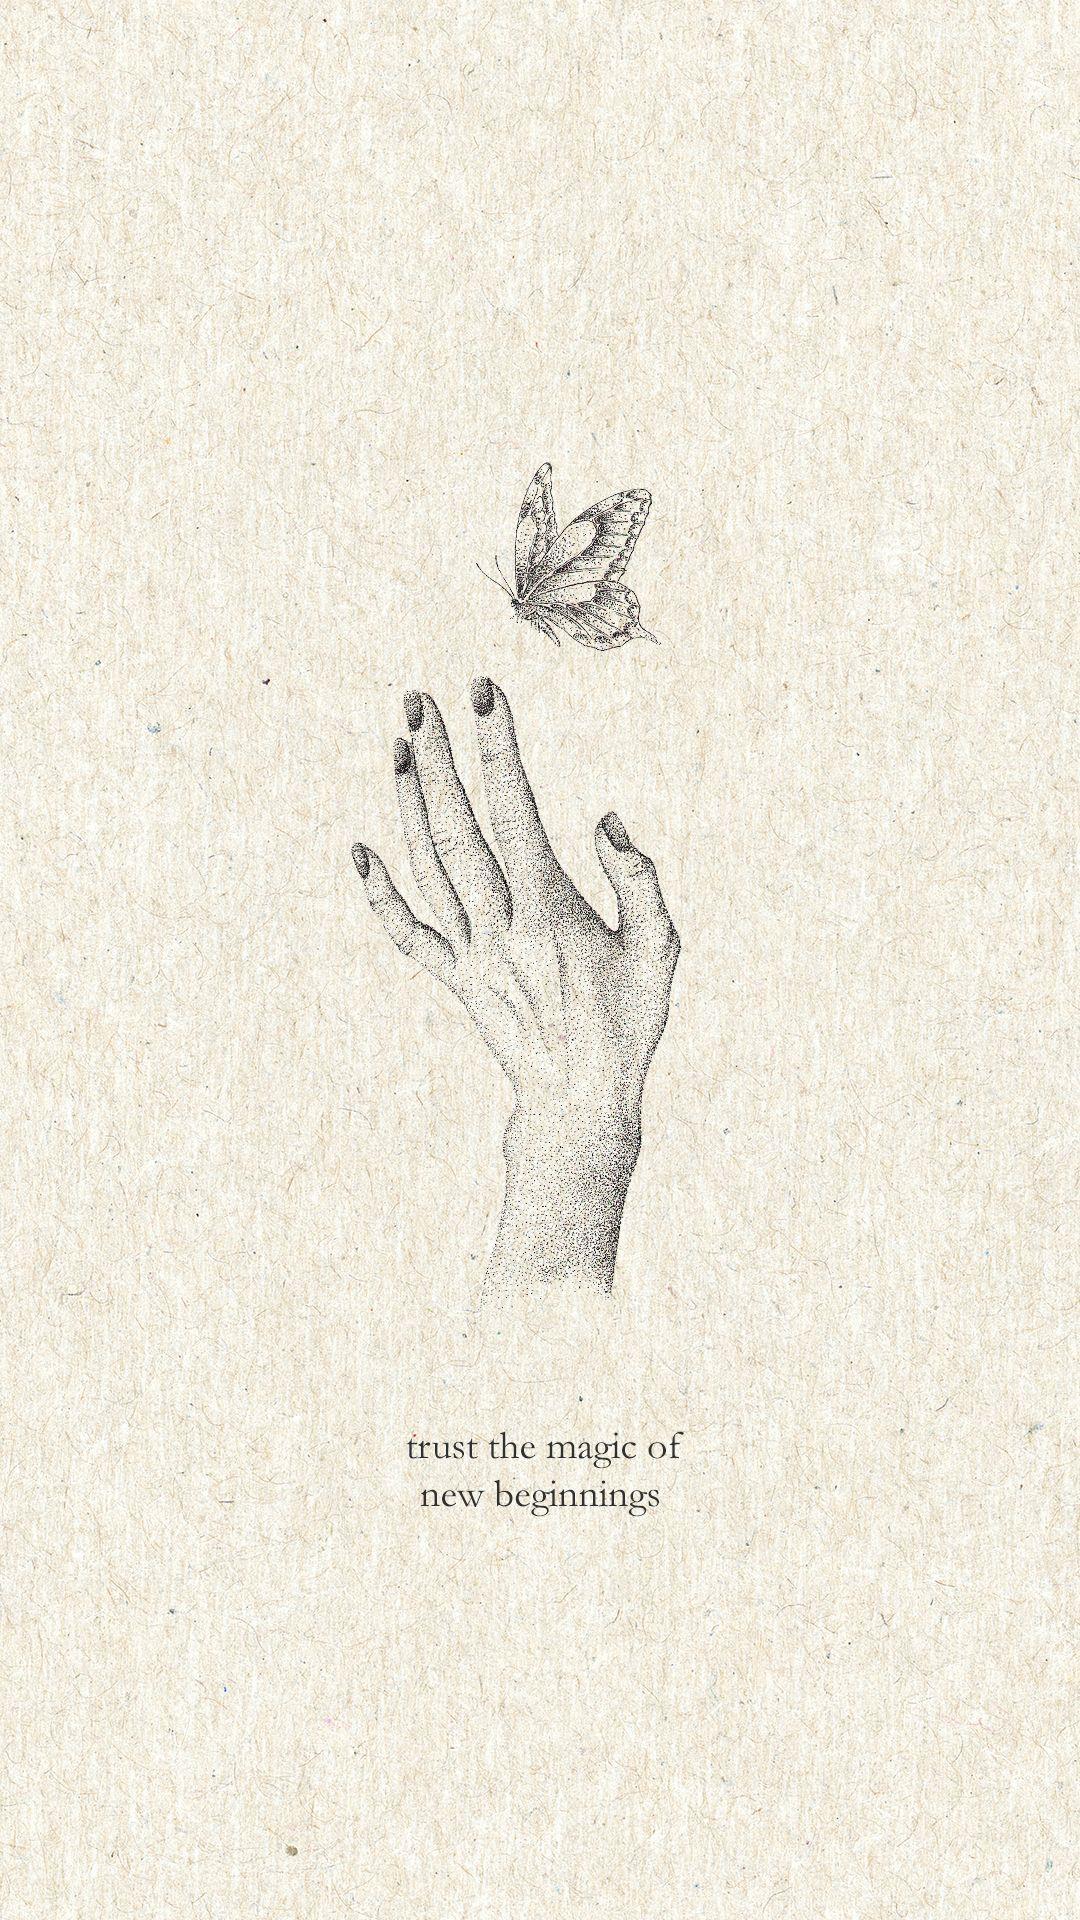 trust the magic of new beginnings